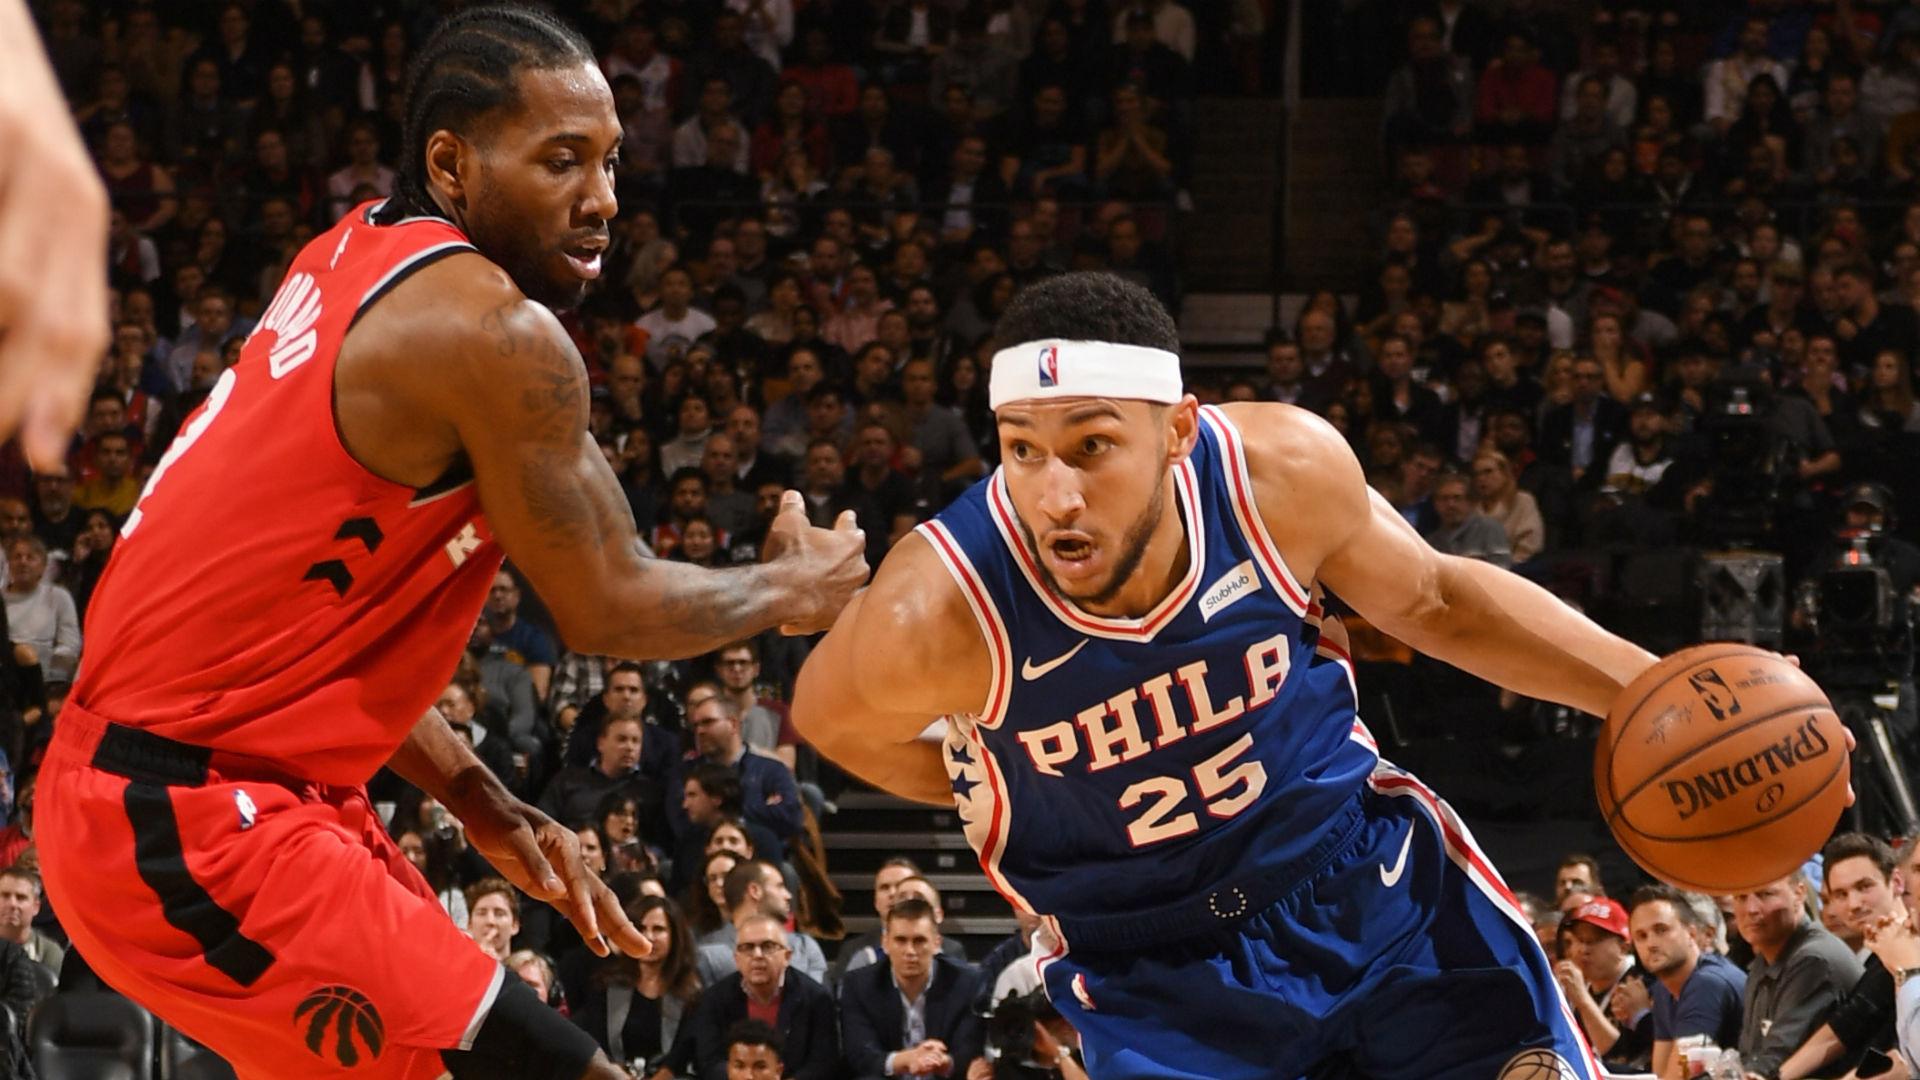 76ers Vs Kings News: Toronto Raptors Vs. Philadelphia 76ers: Game Preview, Live